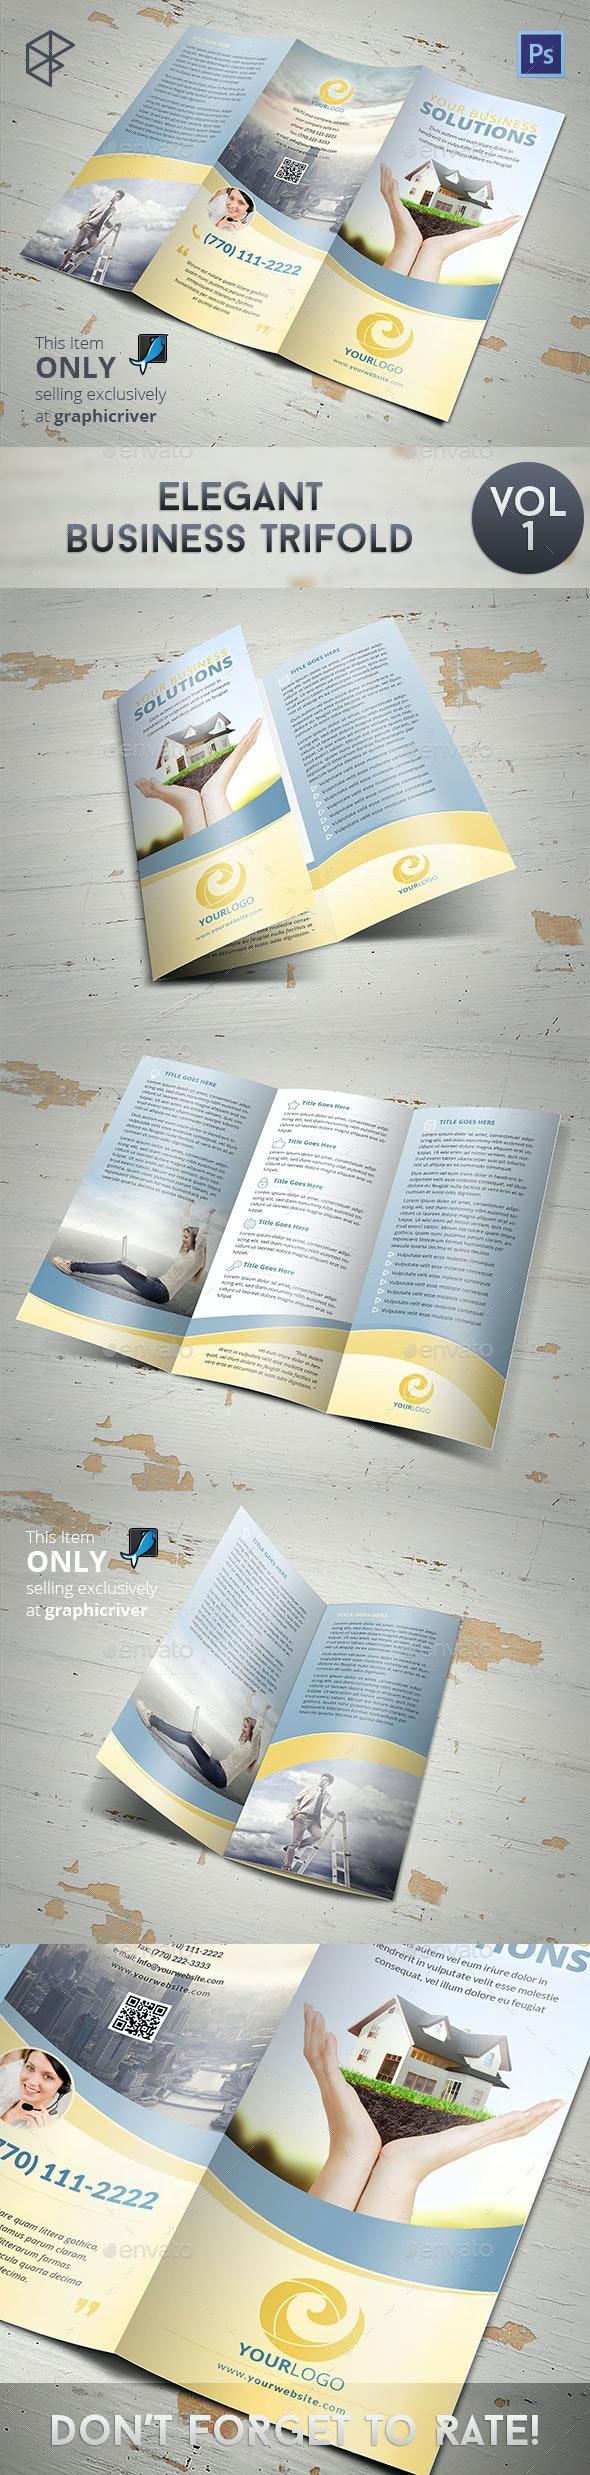 Elegant Business Trifold - Corporate Brochures